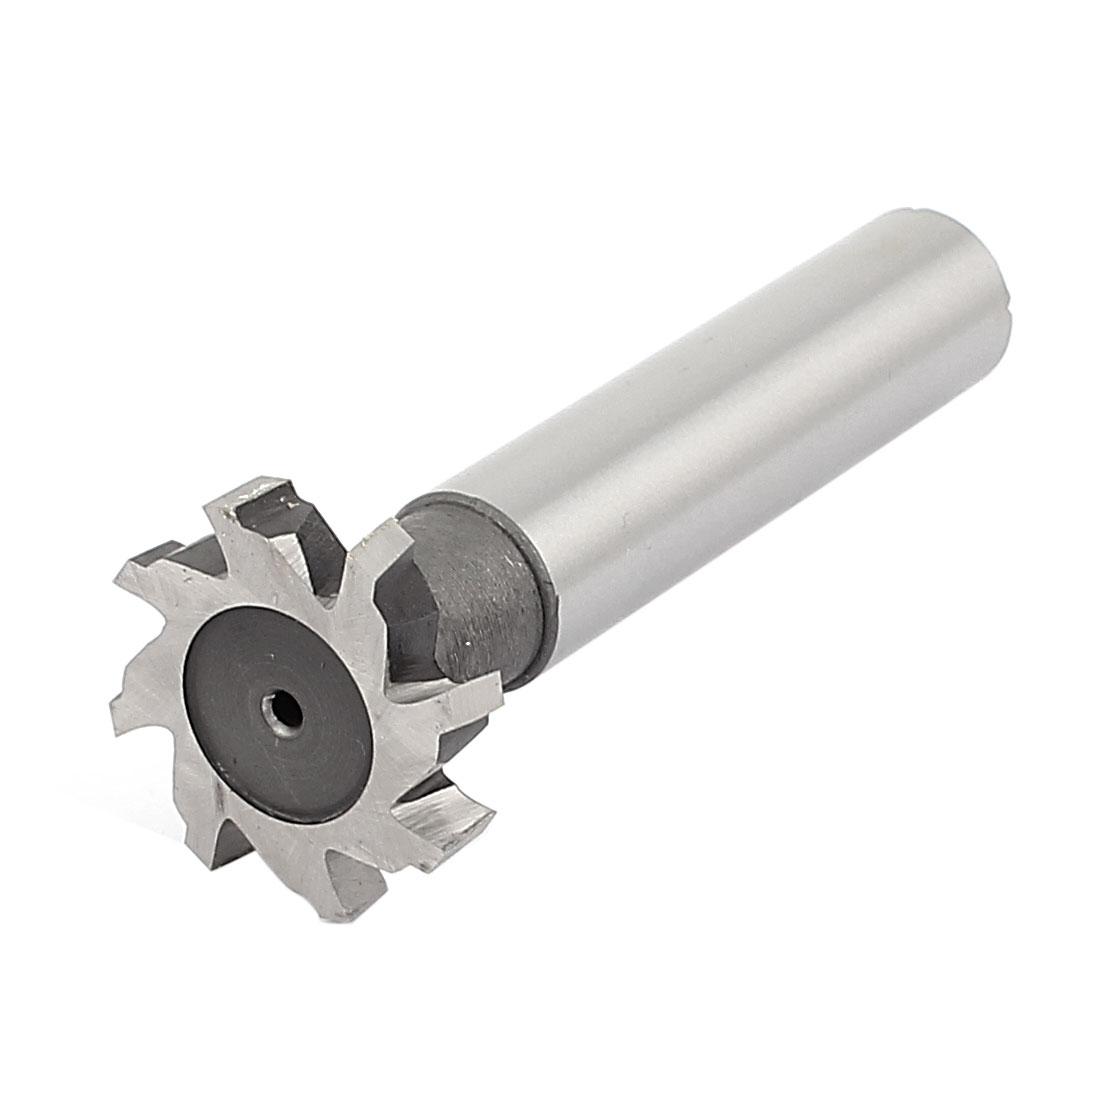 32mm Cutting Dia 6mm Depth HSS-AL 8 Flutes T Slot End Mill Cutter 90mm Long